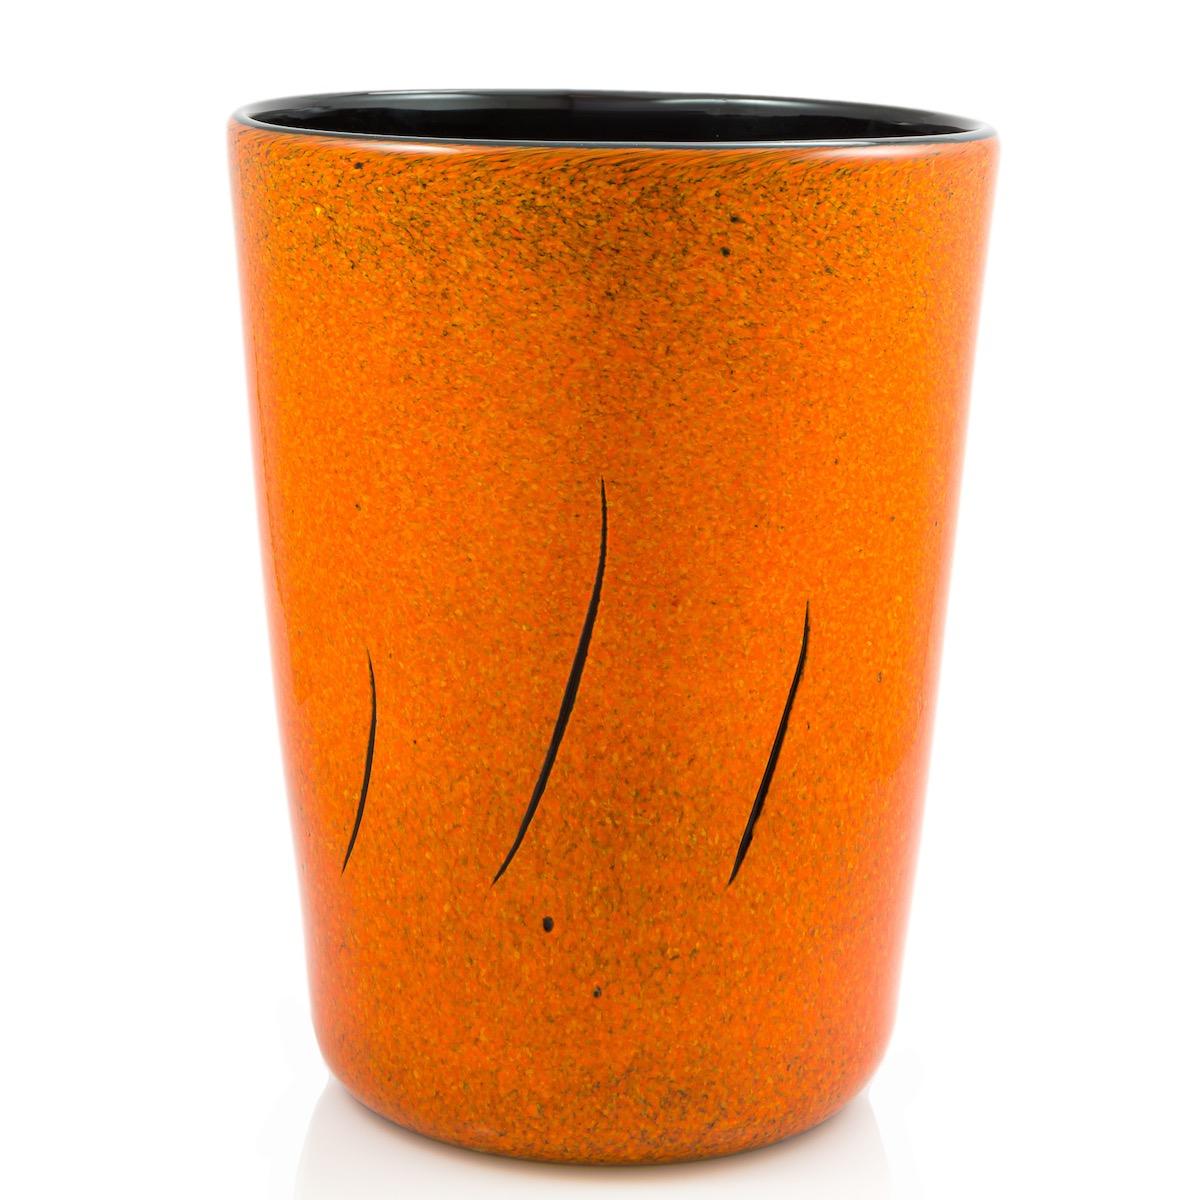 orange-vase-murano-glass-decorative-expensive